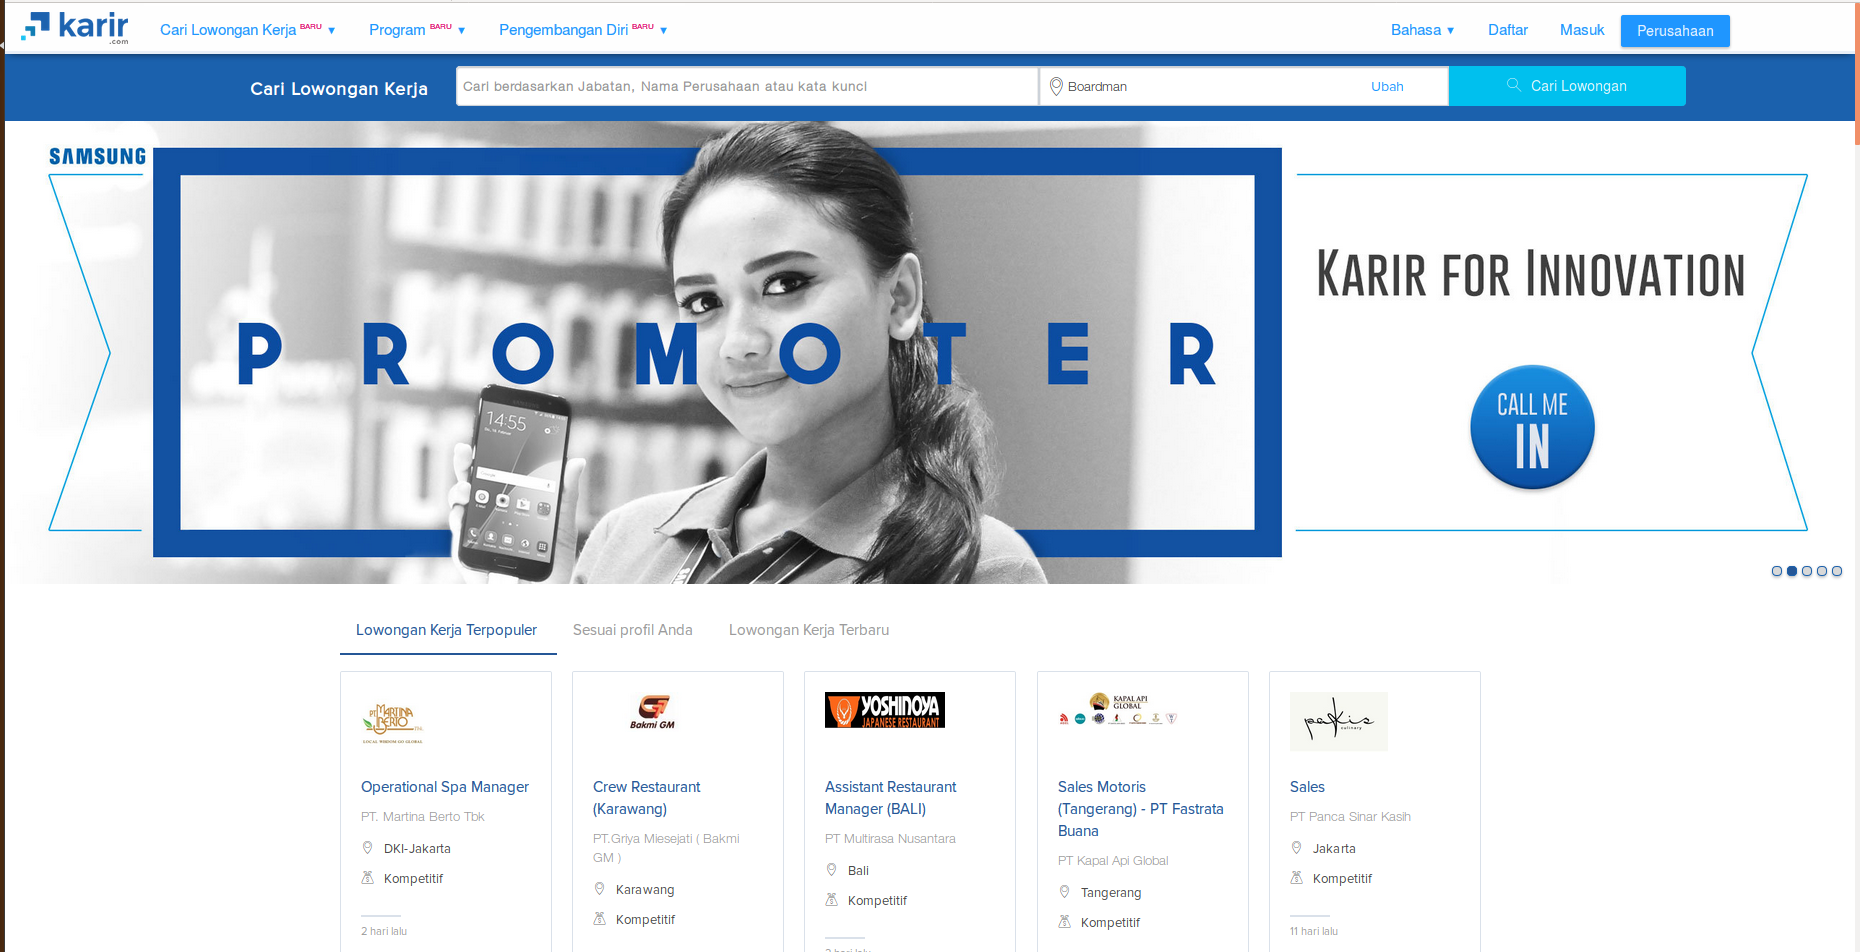 karir.com